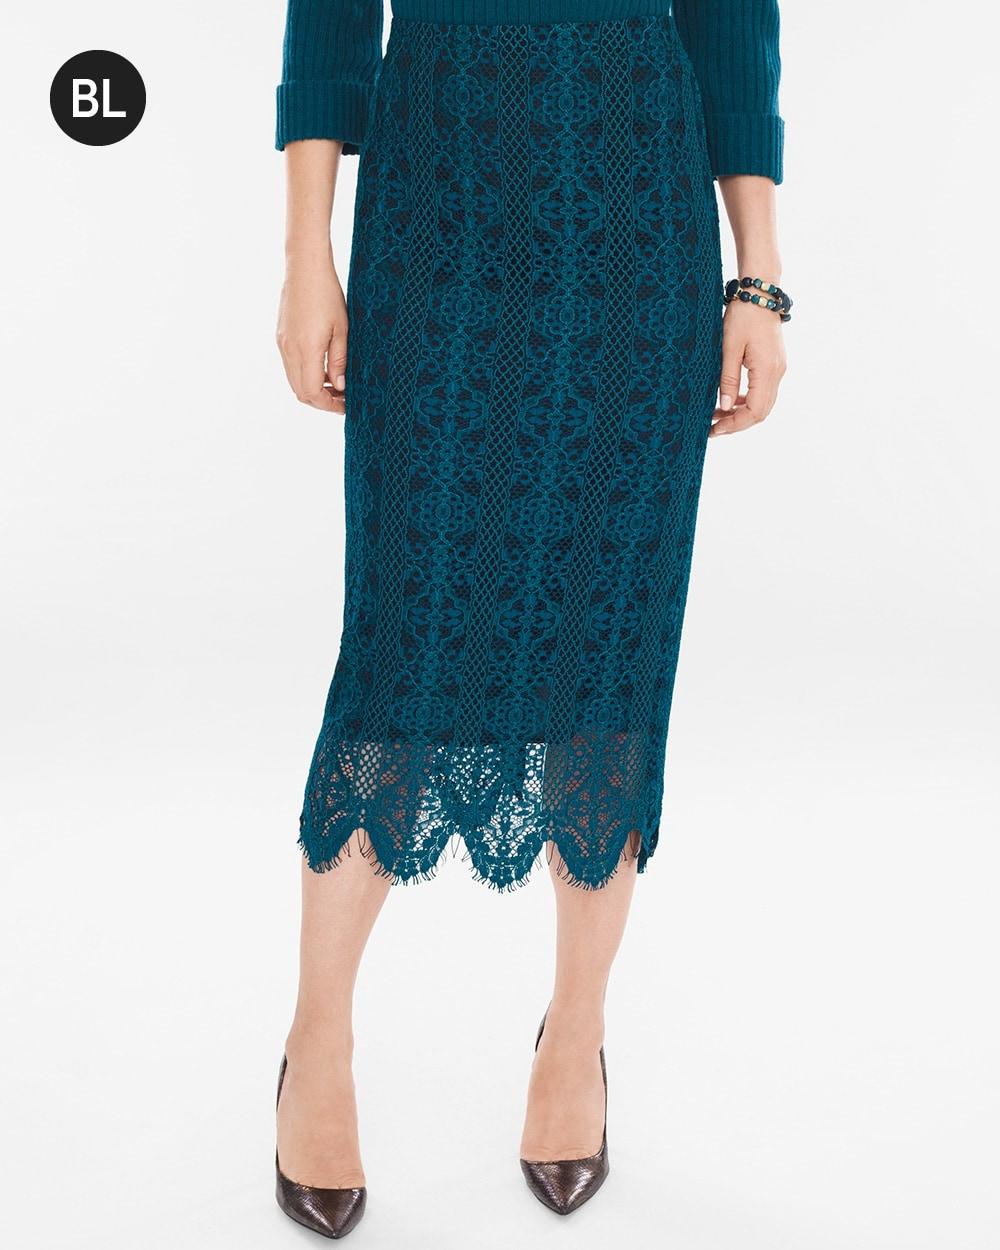 9830b2d2f8 Petite Lace Midi Skirt - Chico's